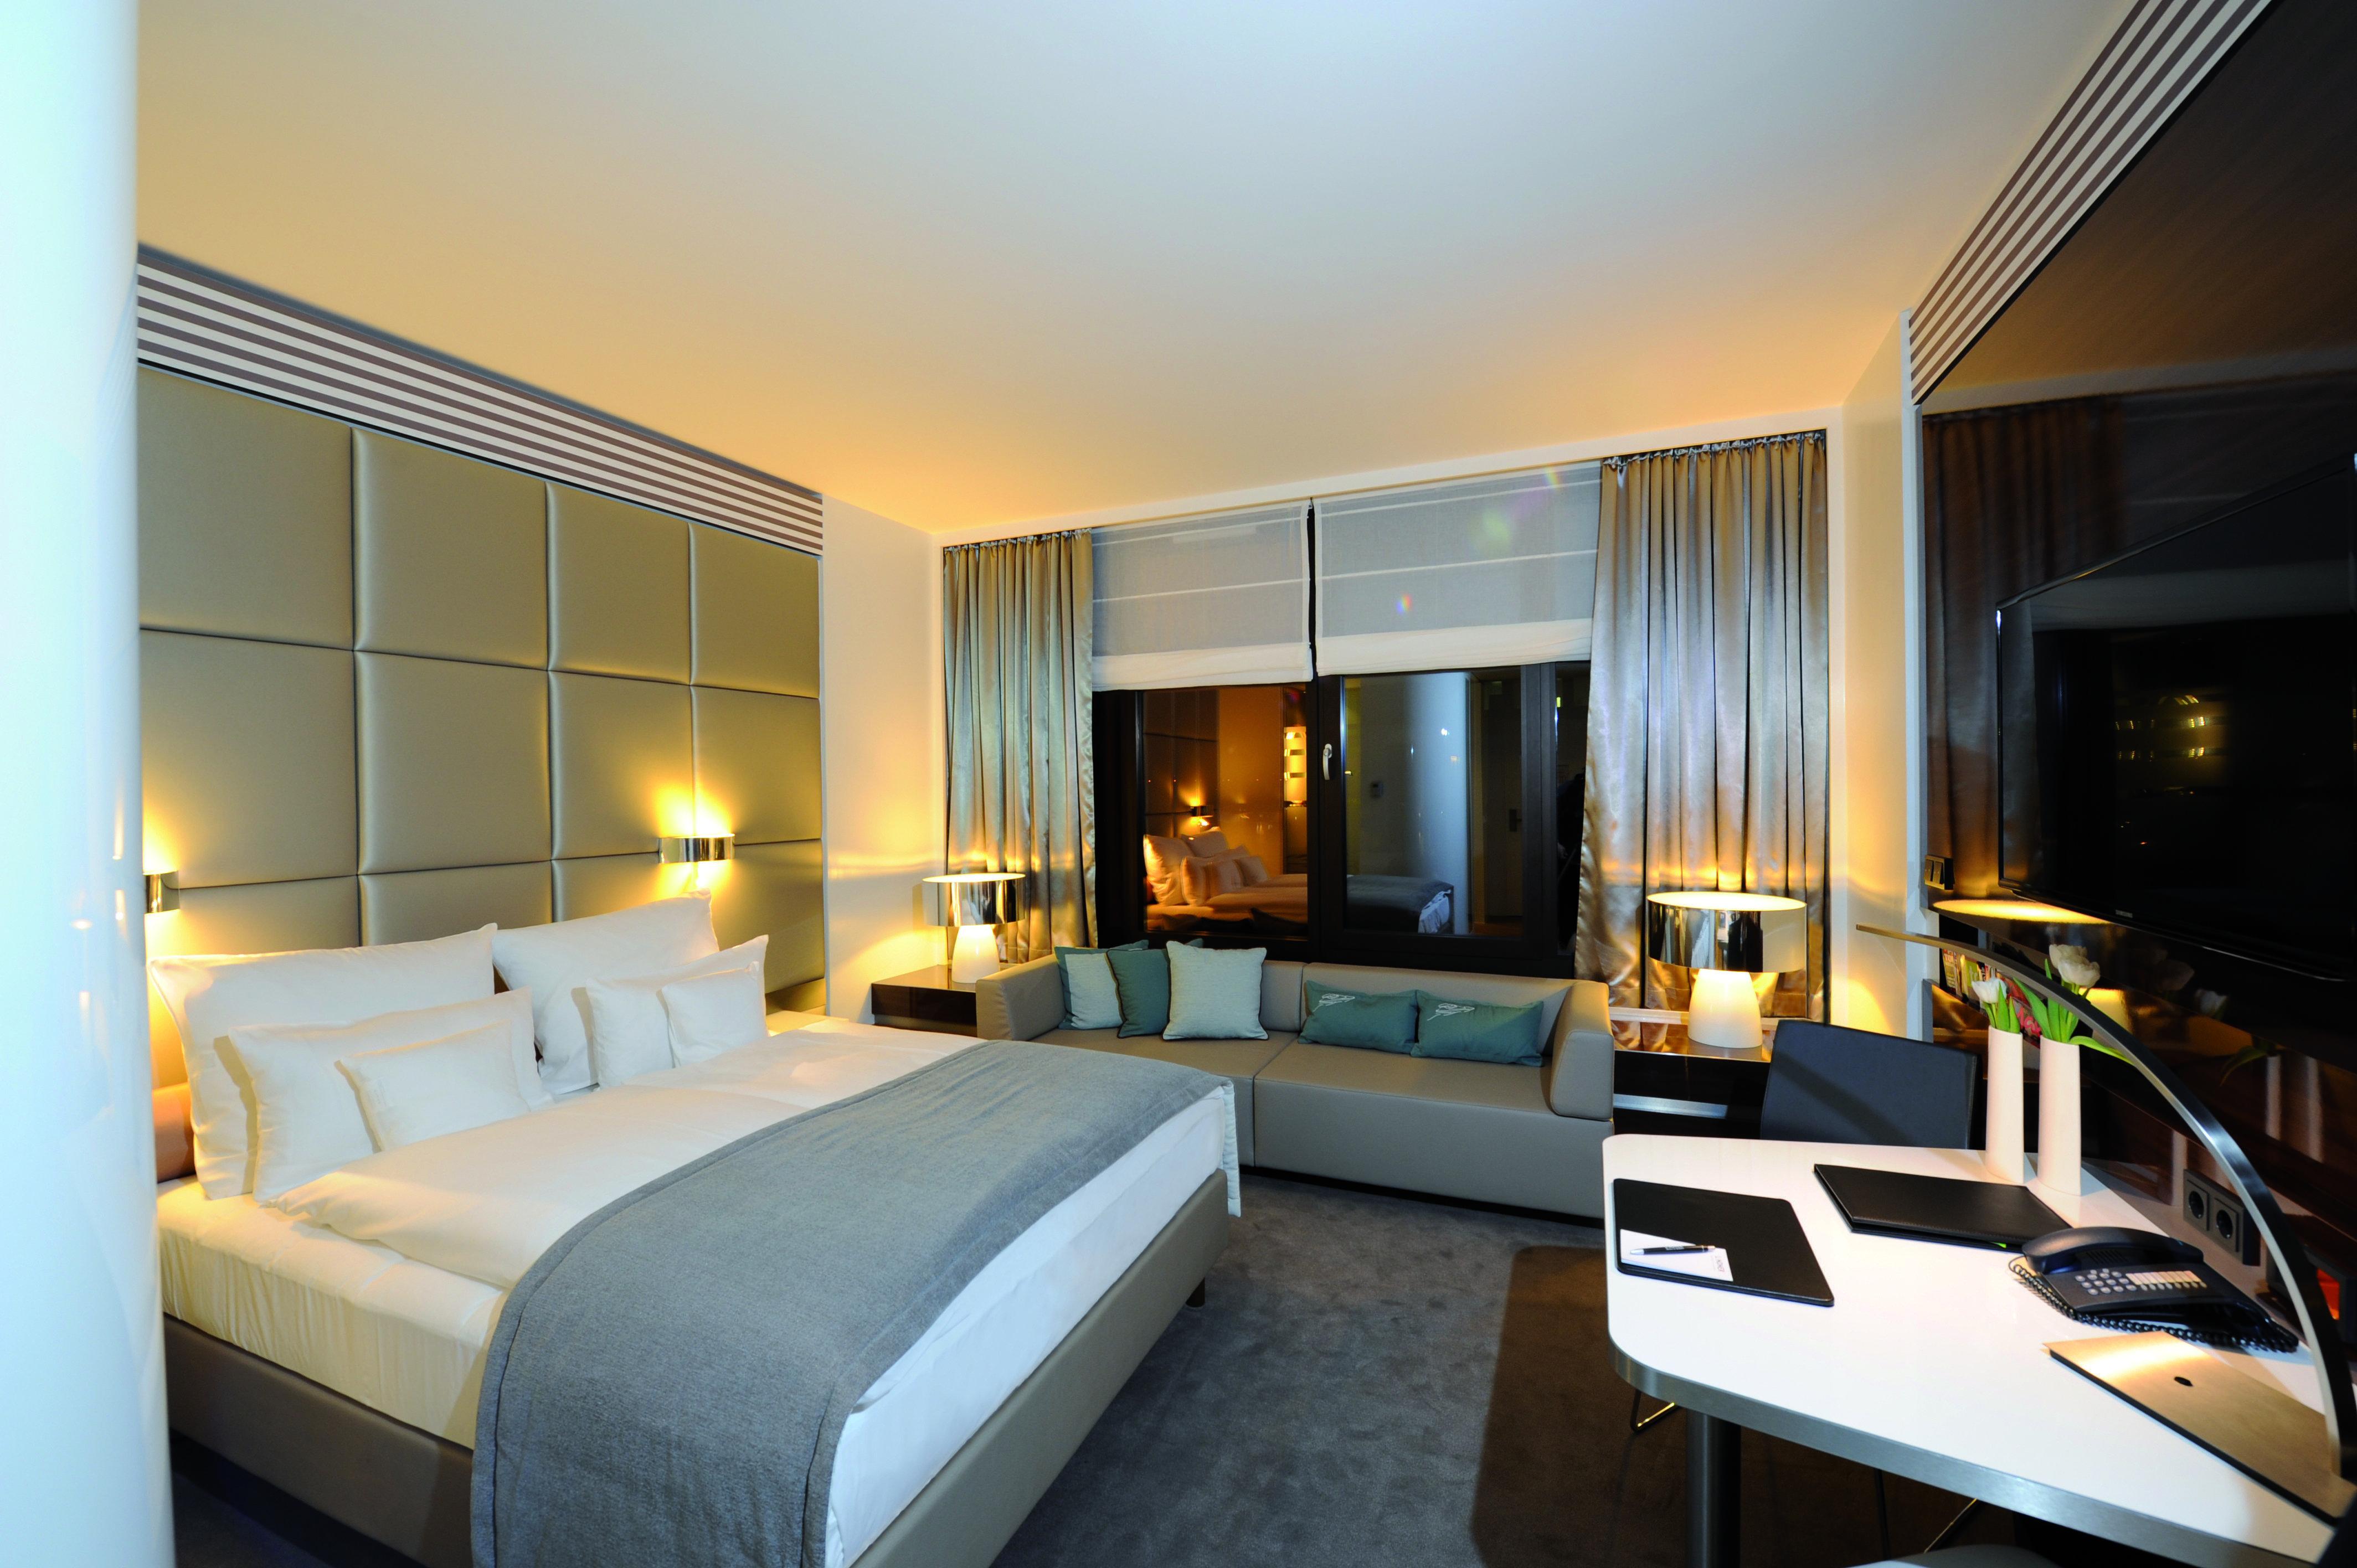 Lindner congress hotel d sseldorf in d sseldorf for Moderne hotels nrw